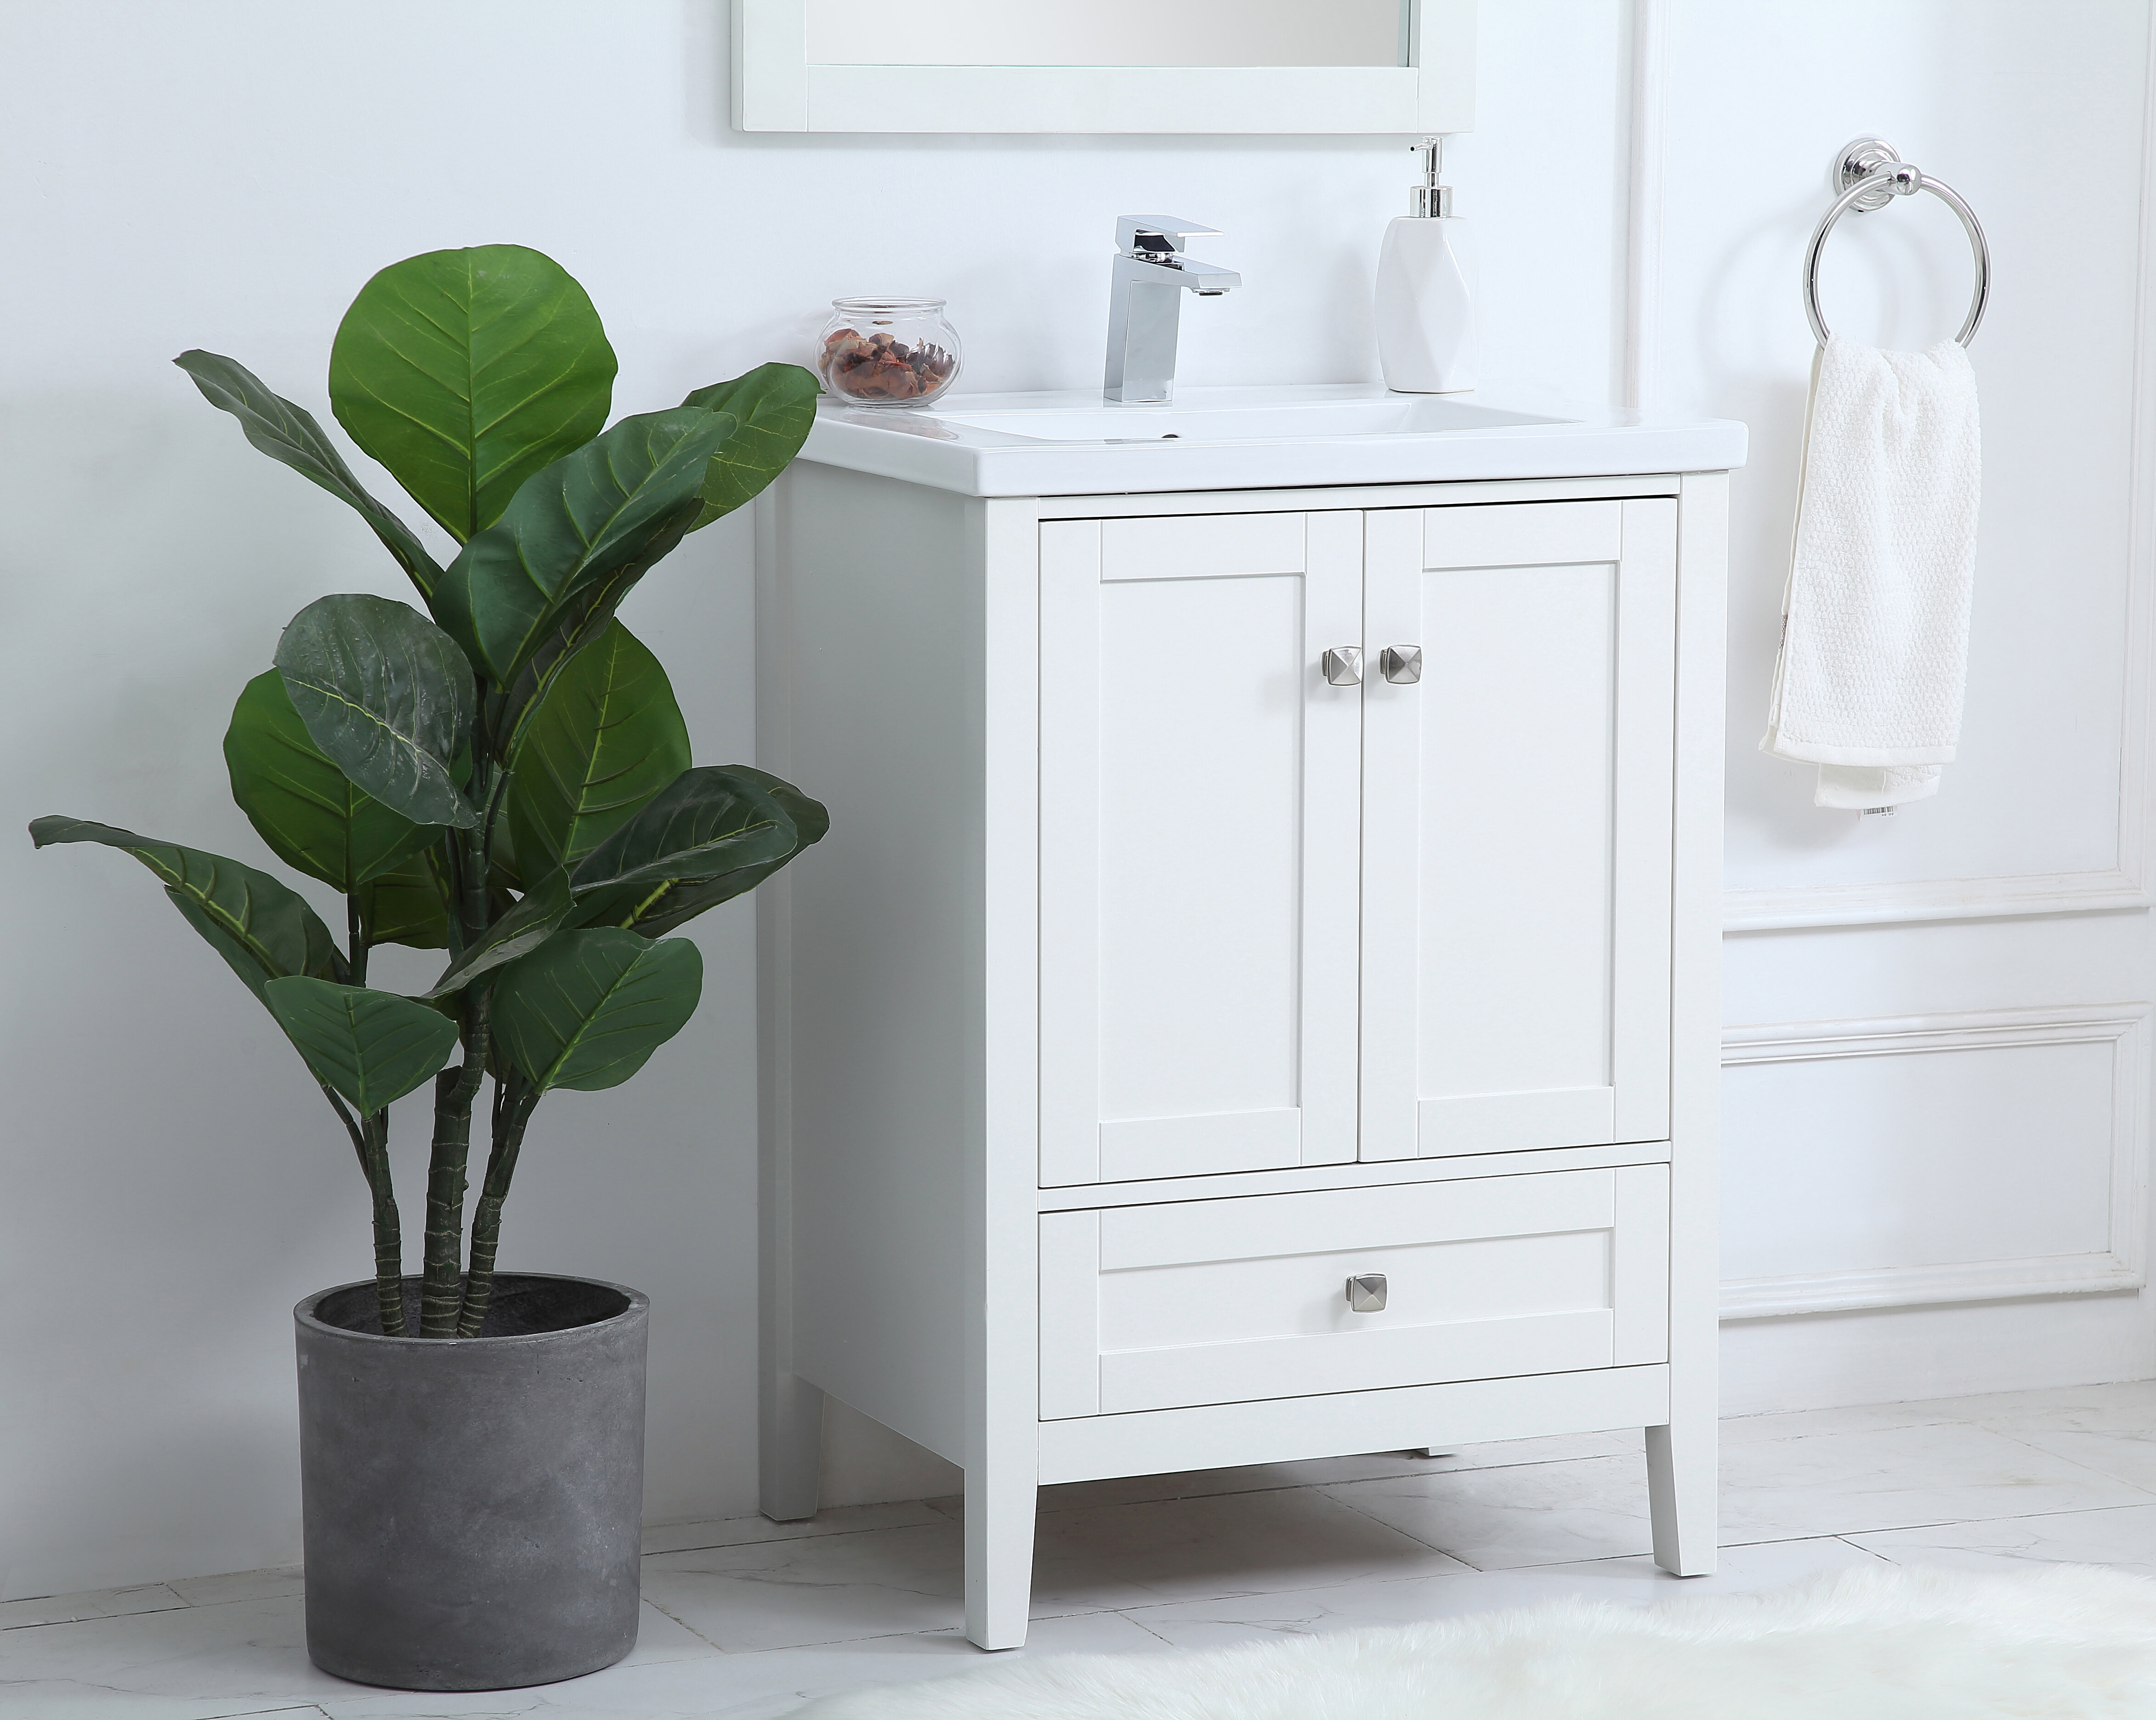 20 25 Bathroom Vanities You Ll Love In 2021 Wayfair